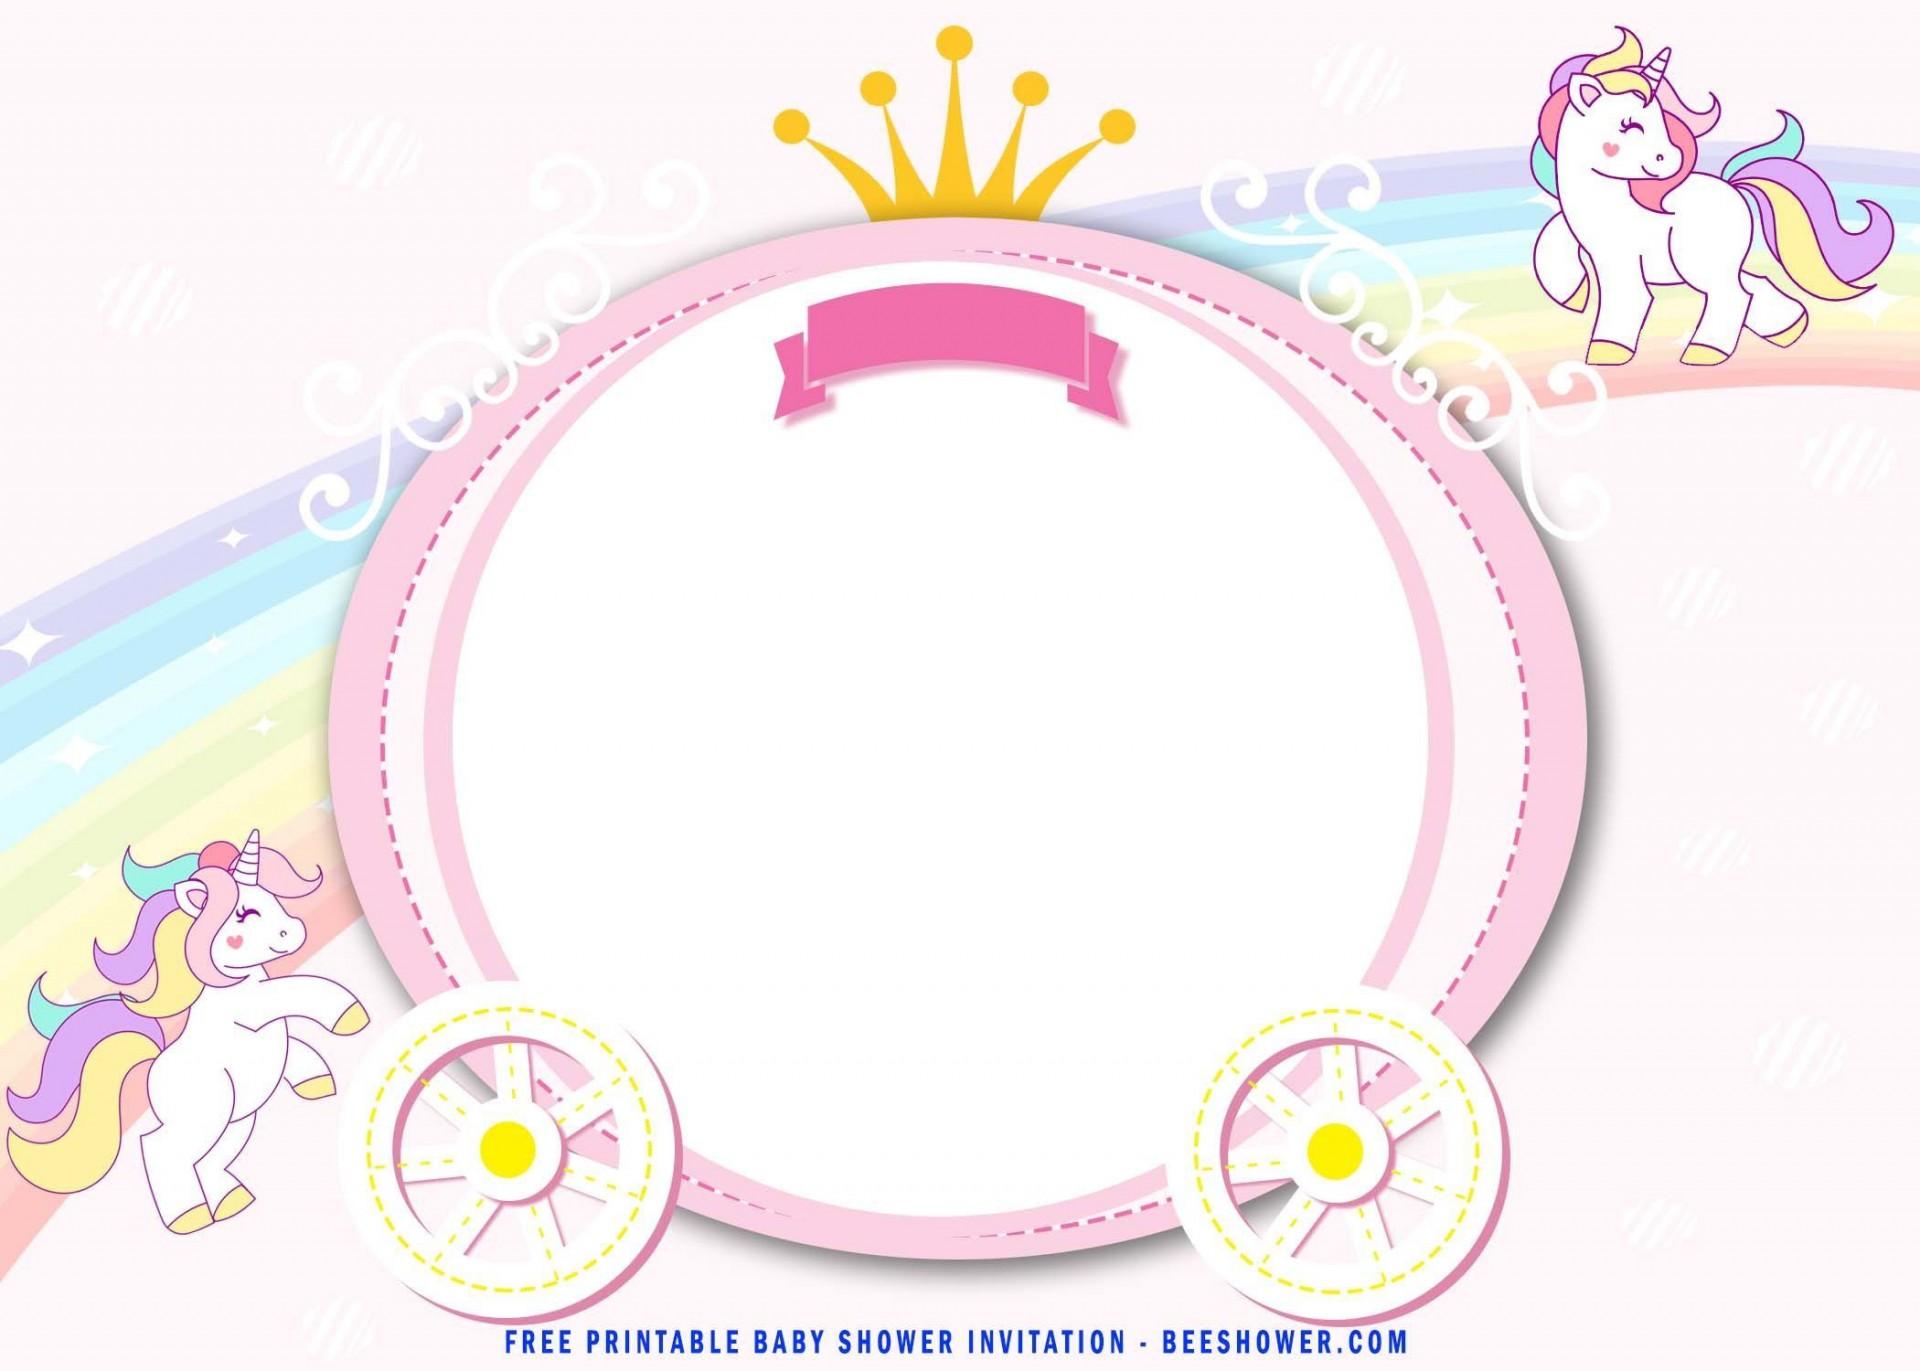 001 Phenomenal Unicorn Baby Shower Template Free Download Picture  Printable Invitation1920